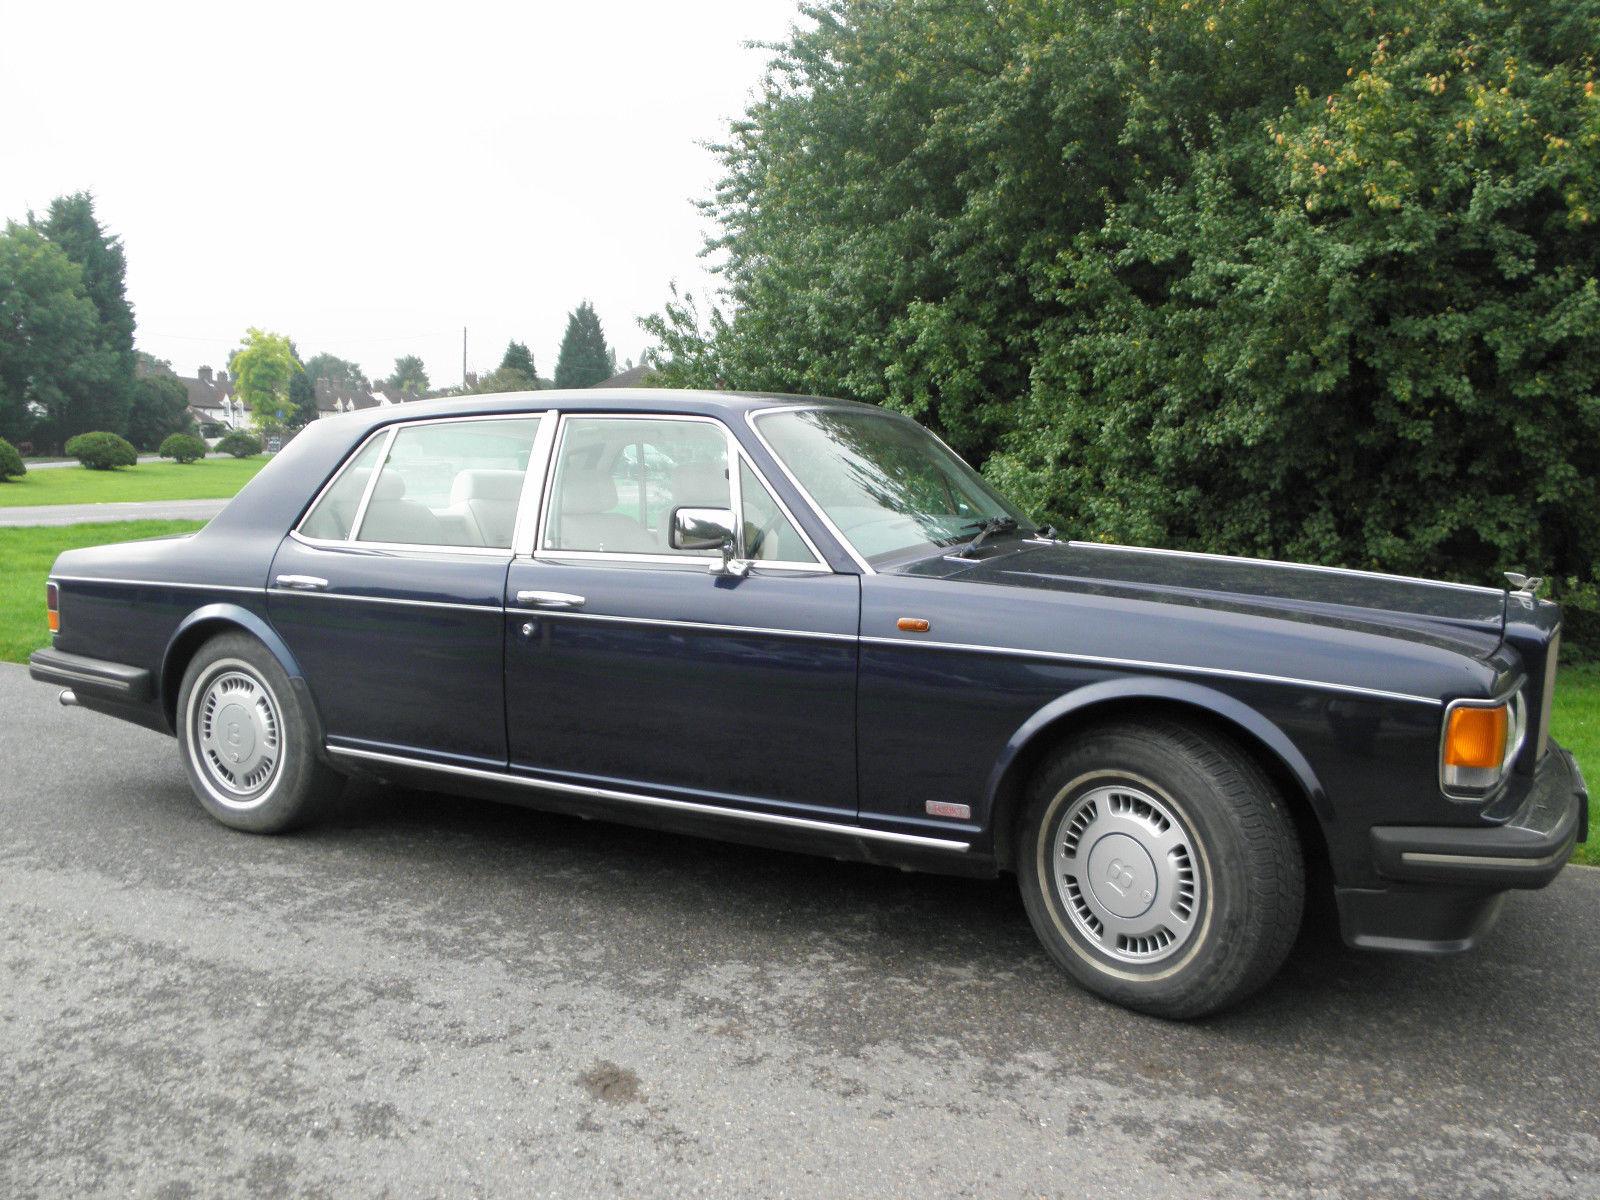 Kurt's Classics: 1986 Bentley Turbo R - ClickMechanic